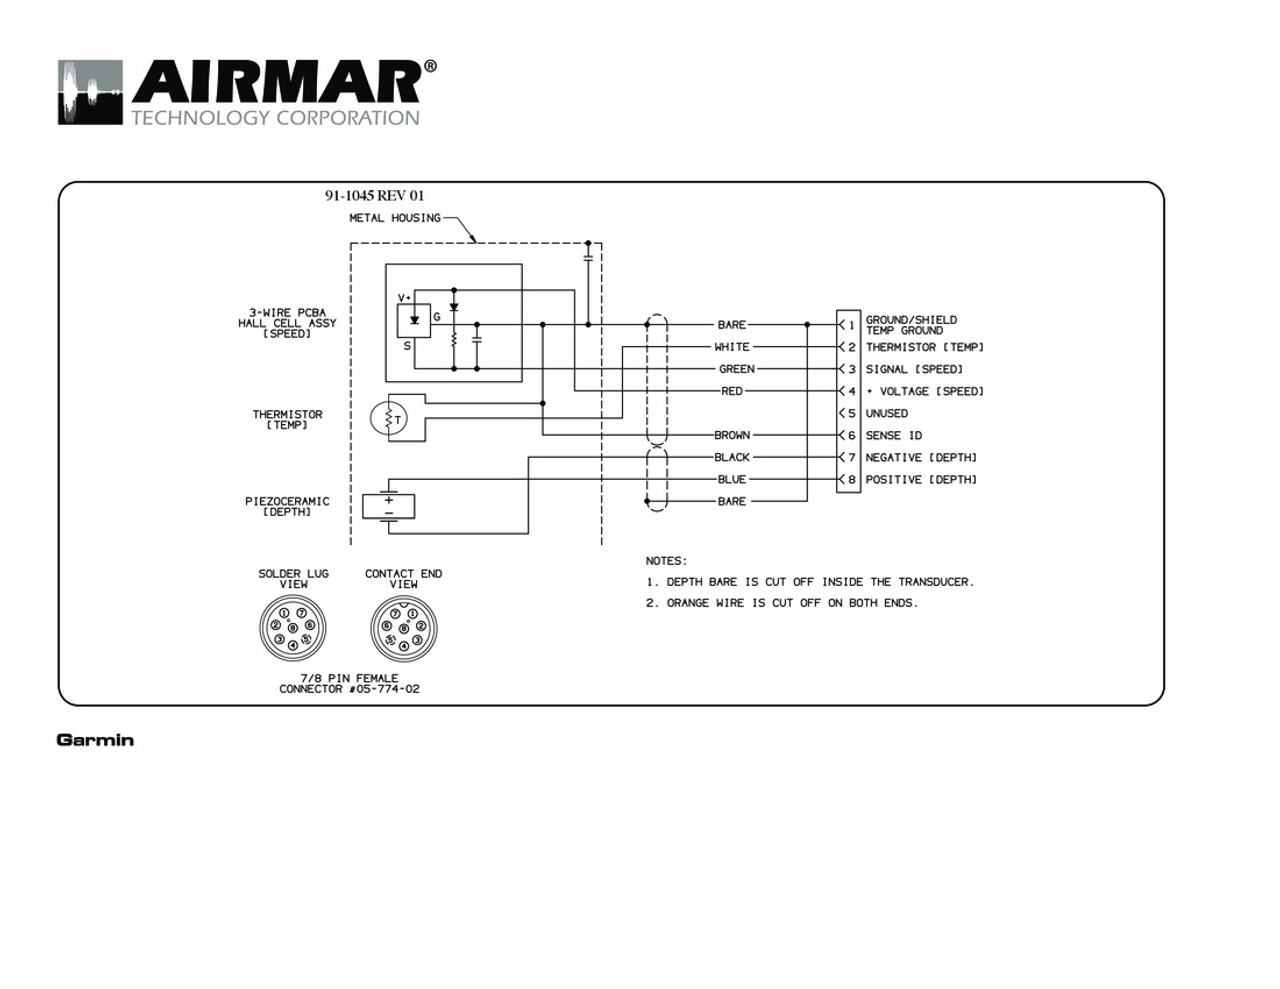 Phone 8 Pin Wiring Diagram Another Blog About For Nr 51 Airmar Garmin B744 D S T Blue Bottle Marine Rh Bluebottlemarine Com